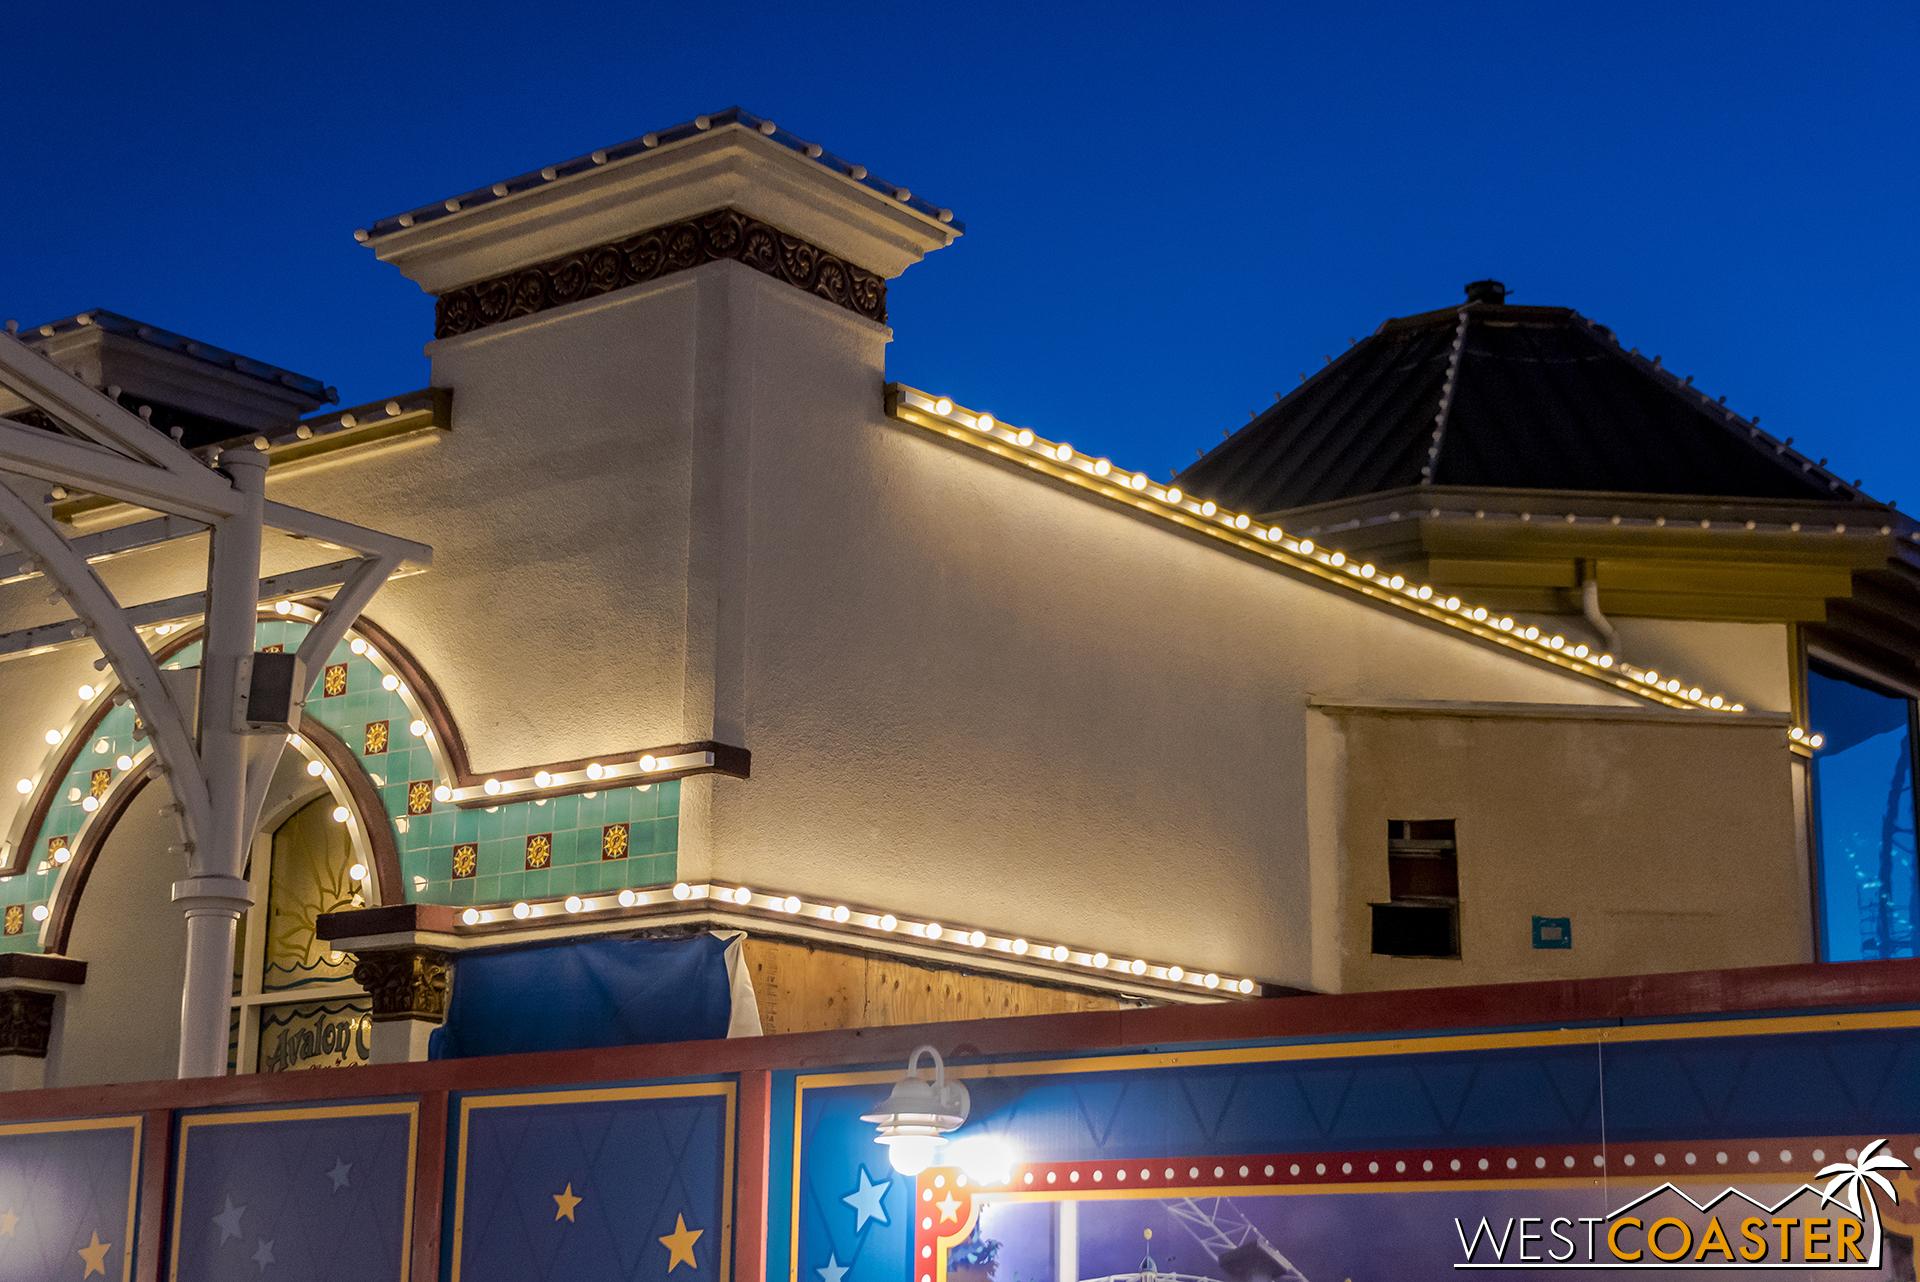 Lamplight Lounge will be a Pixar themed dining establishment.